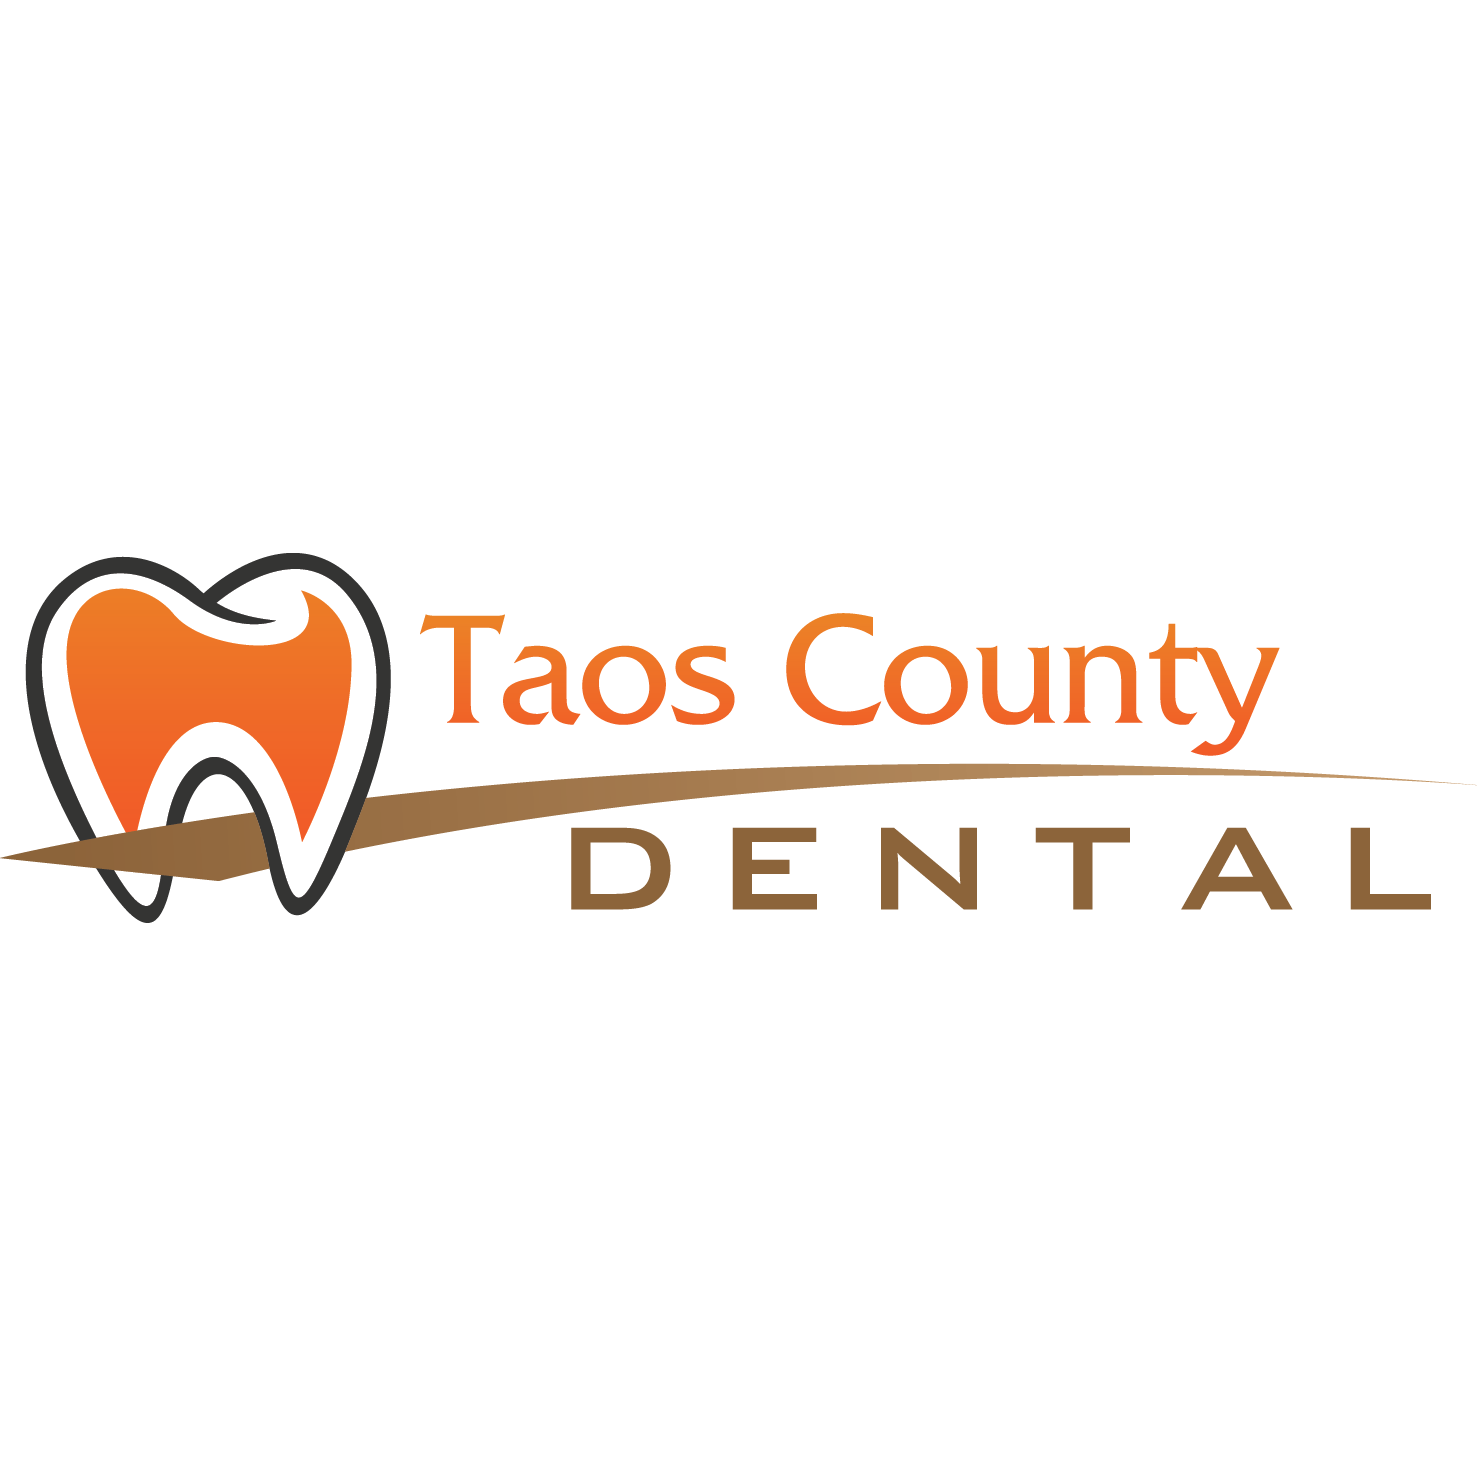 Taos County Dental